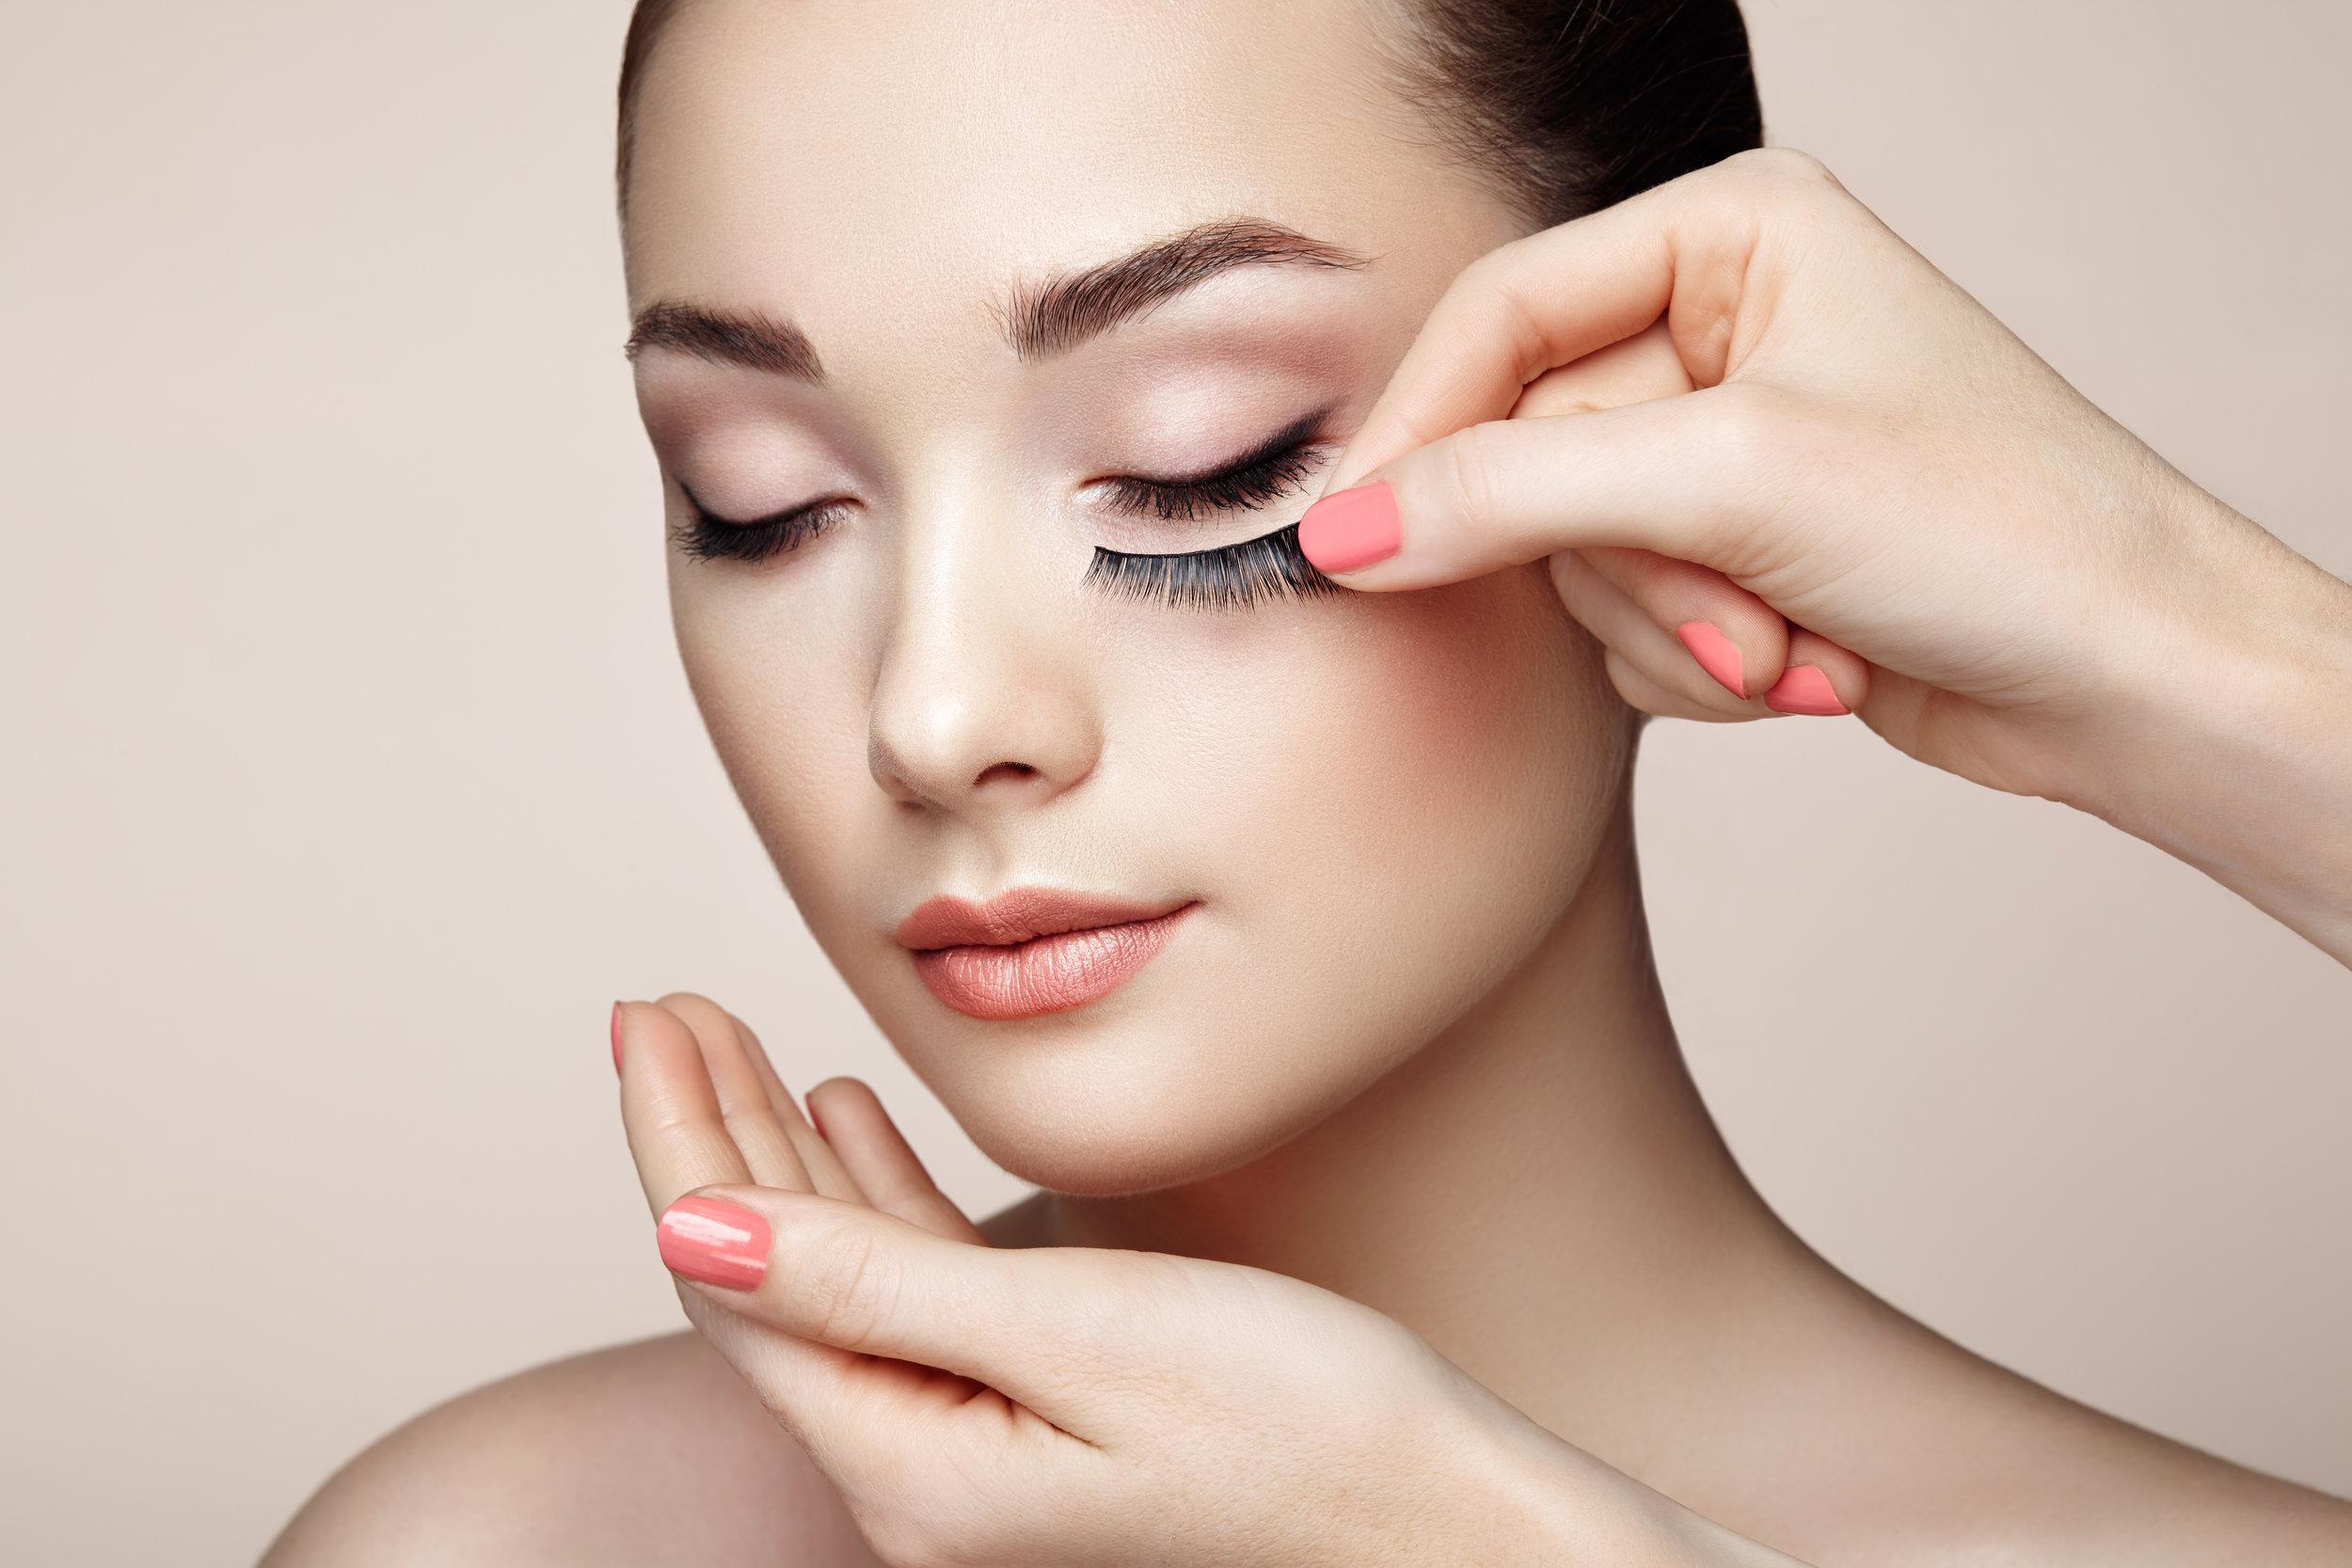 makeup-artist-glues-eyelashes-PKSFGQR.jpg